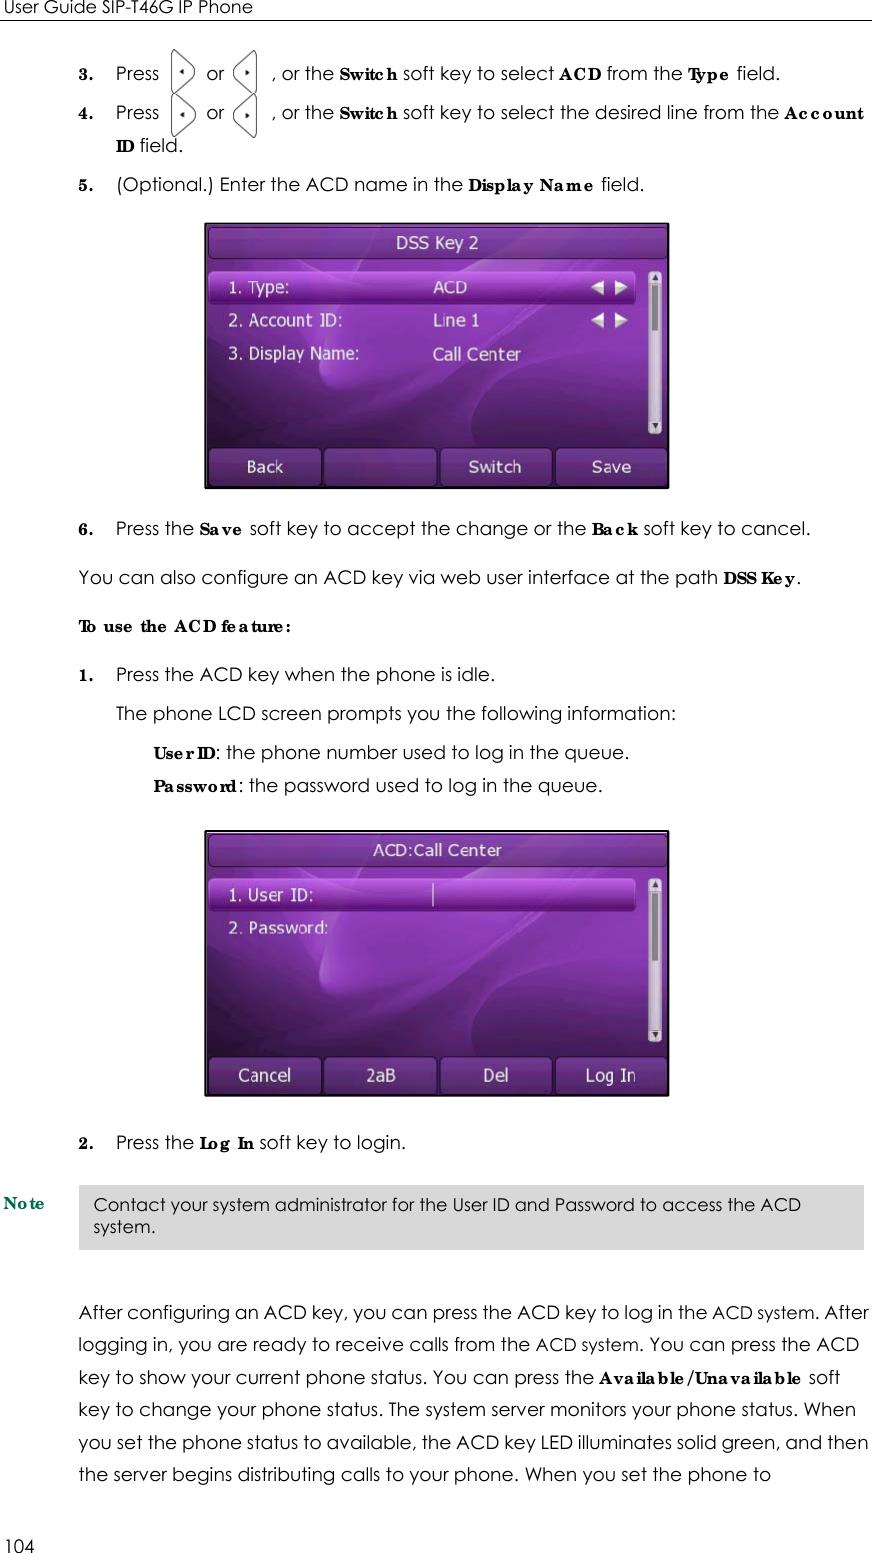 YEALINK T46G IP Phone User Manual SIP T46G 1 User Guide V70x